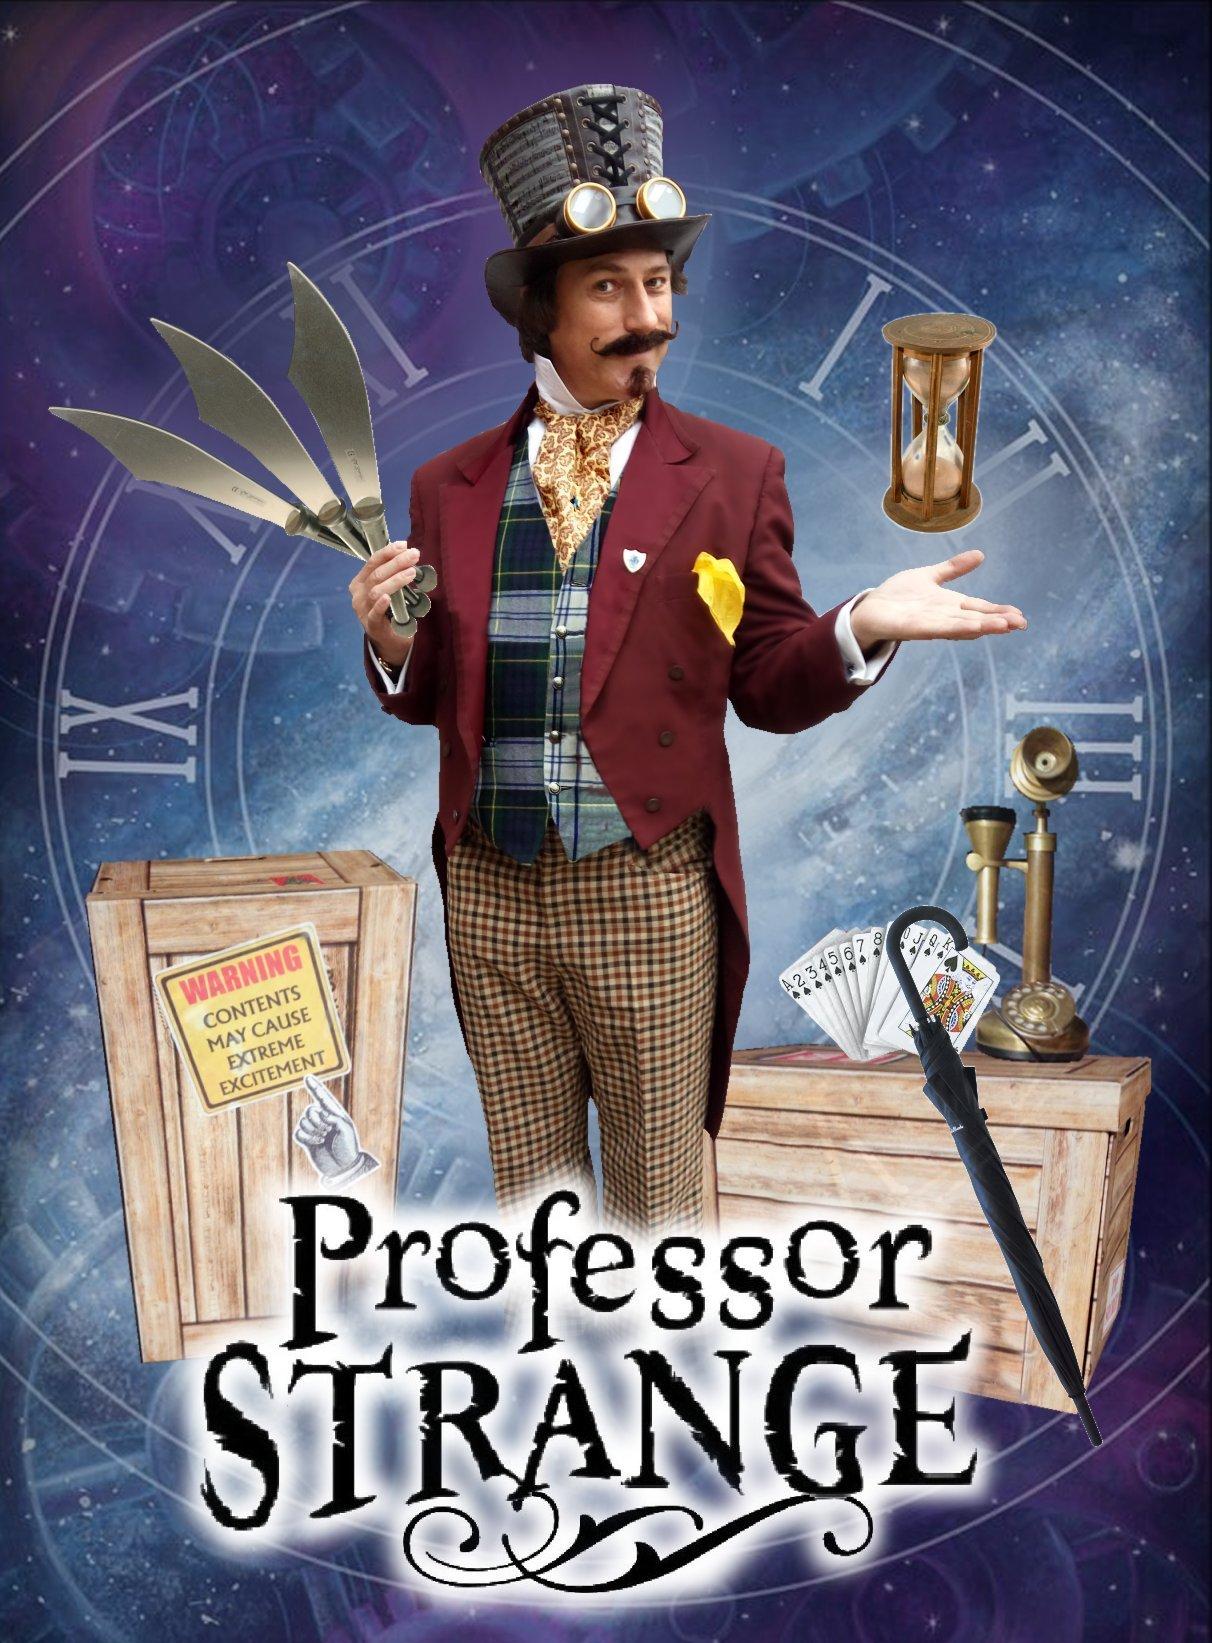 Professor Strange - Magical street theatre